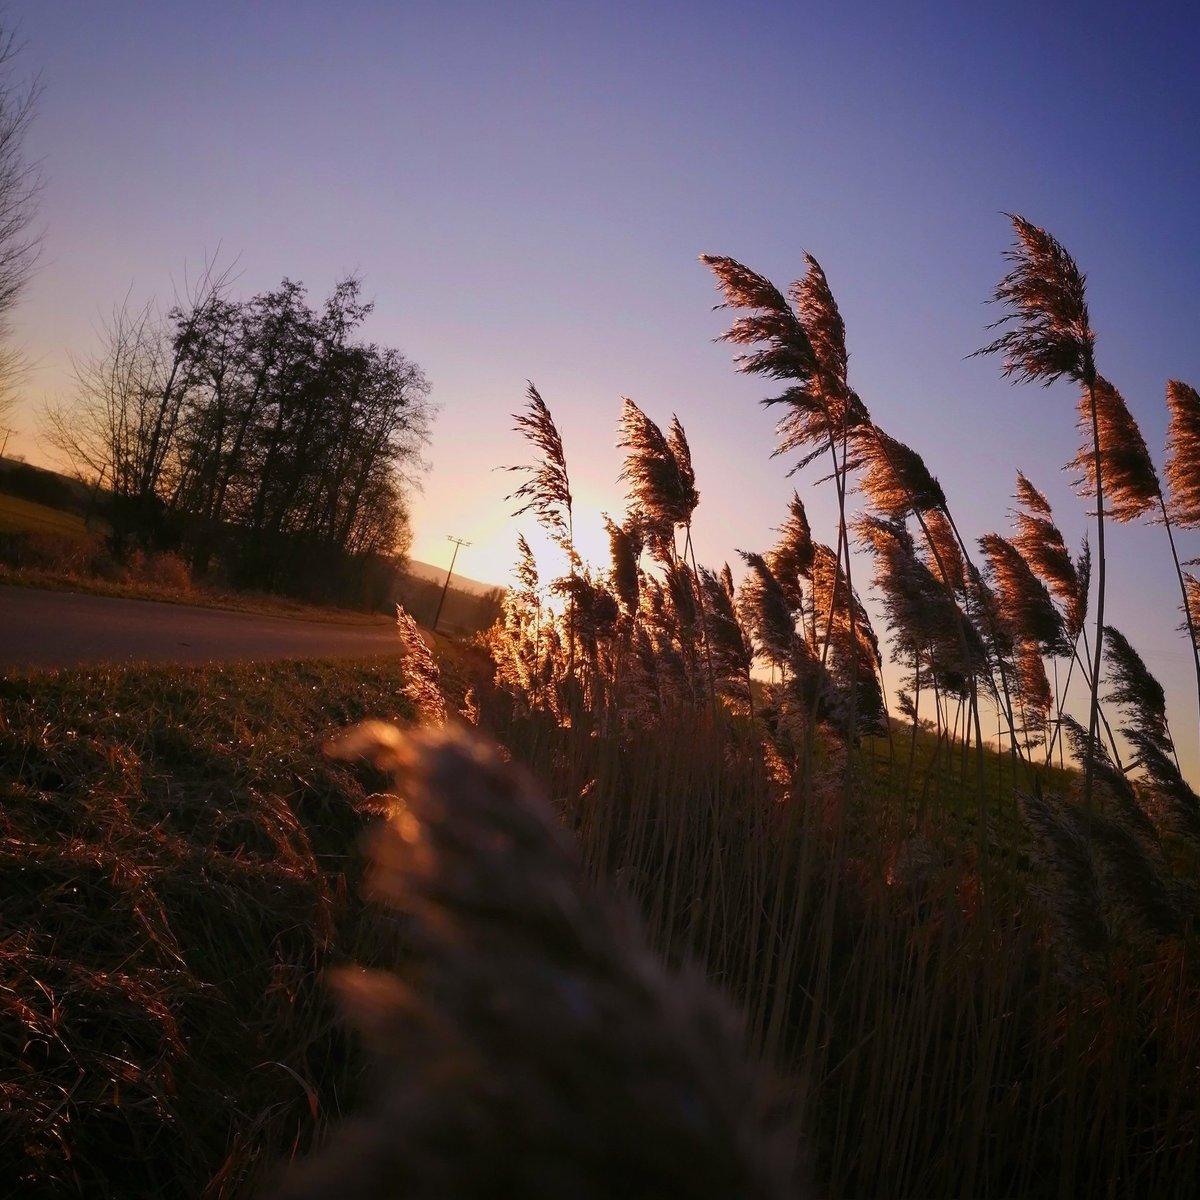 🌇🌄🌞 Sunset 🌞 🌄 🌇 @ мγ ƒανοяιτє ρℓαϲє  #nature #sunset #favoriteplace #photography #Goodnight